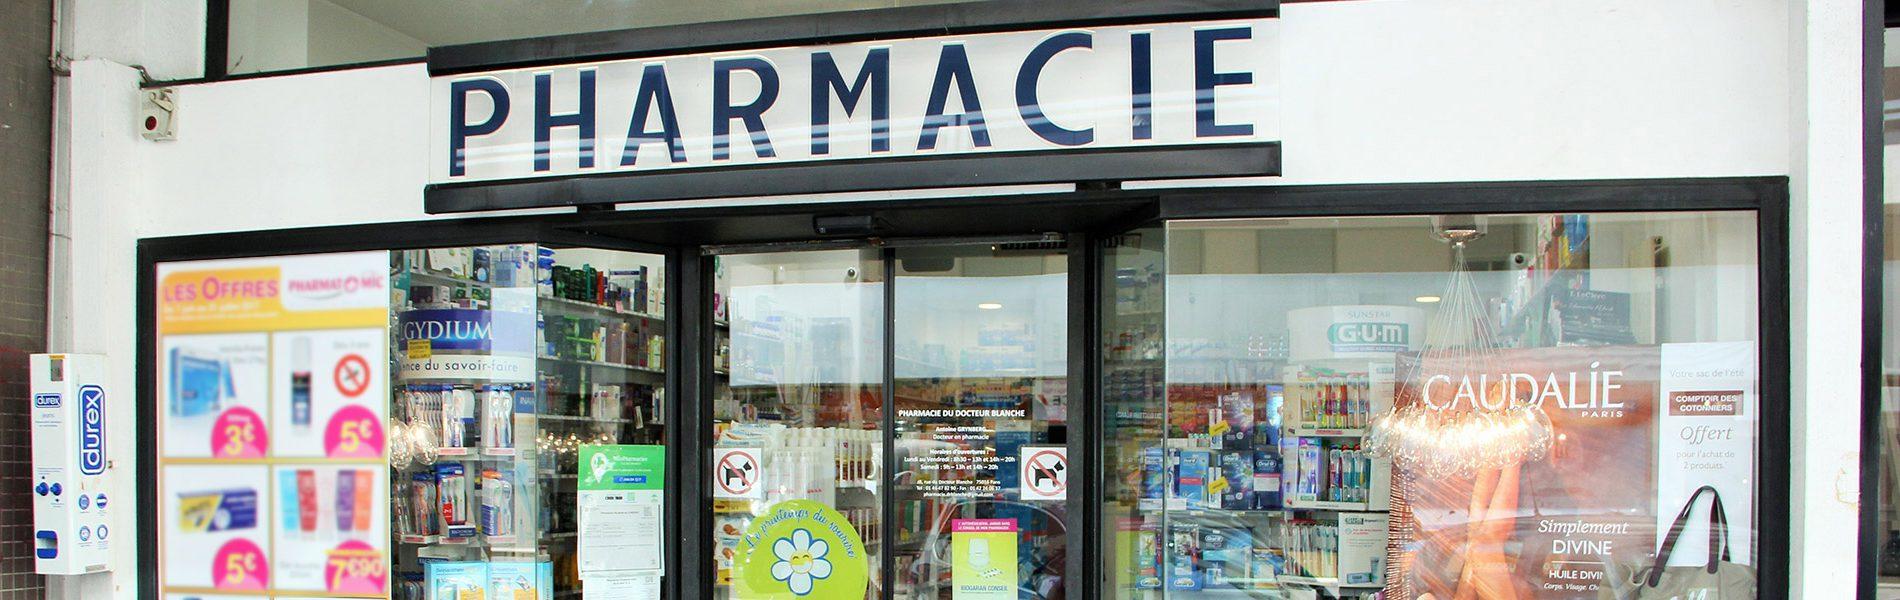 Pharmacie DU DOCTEUR BLANCHE - Image Homepage 1